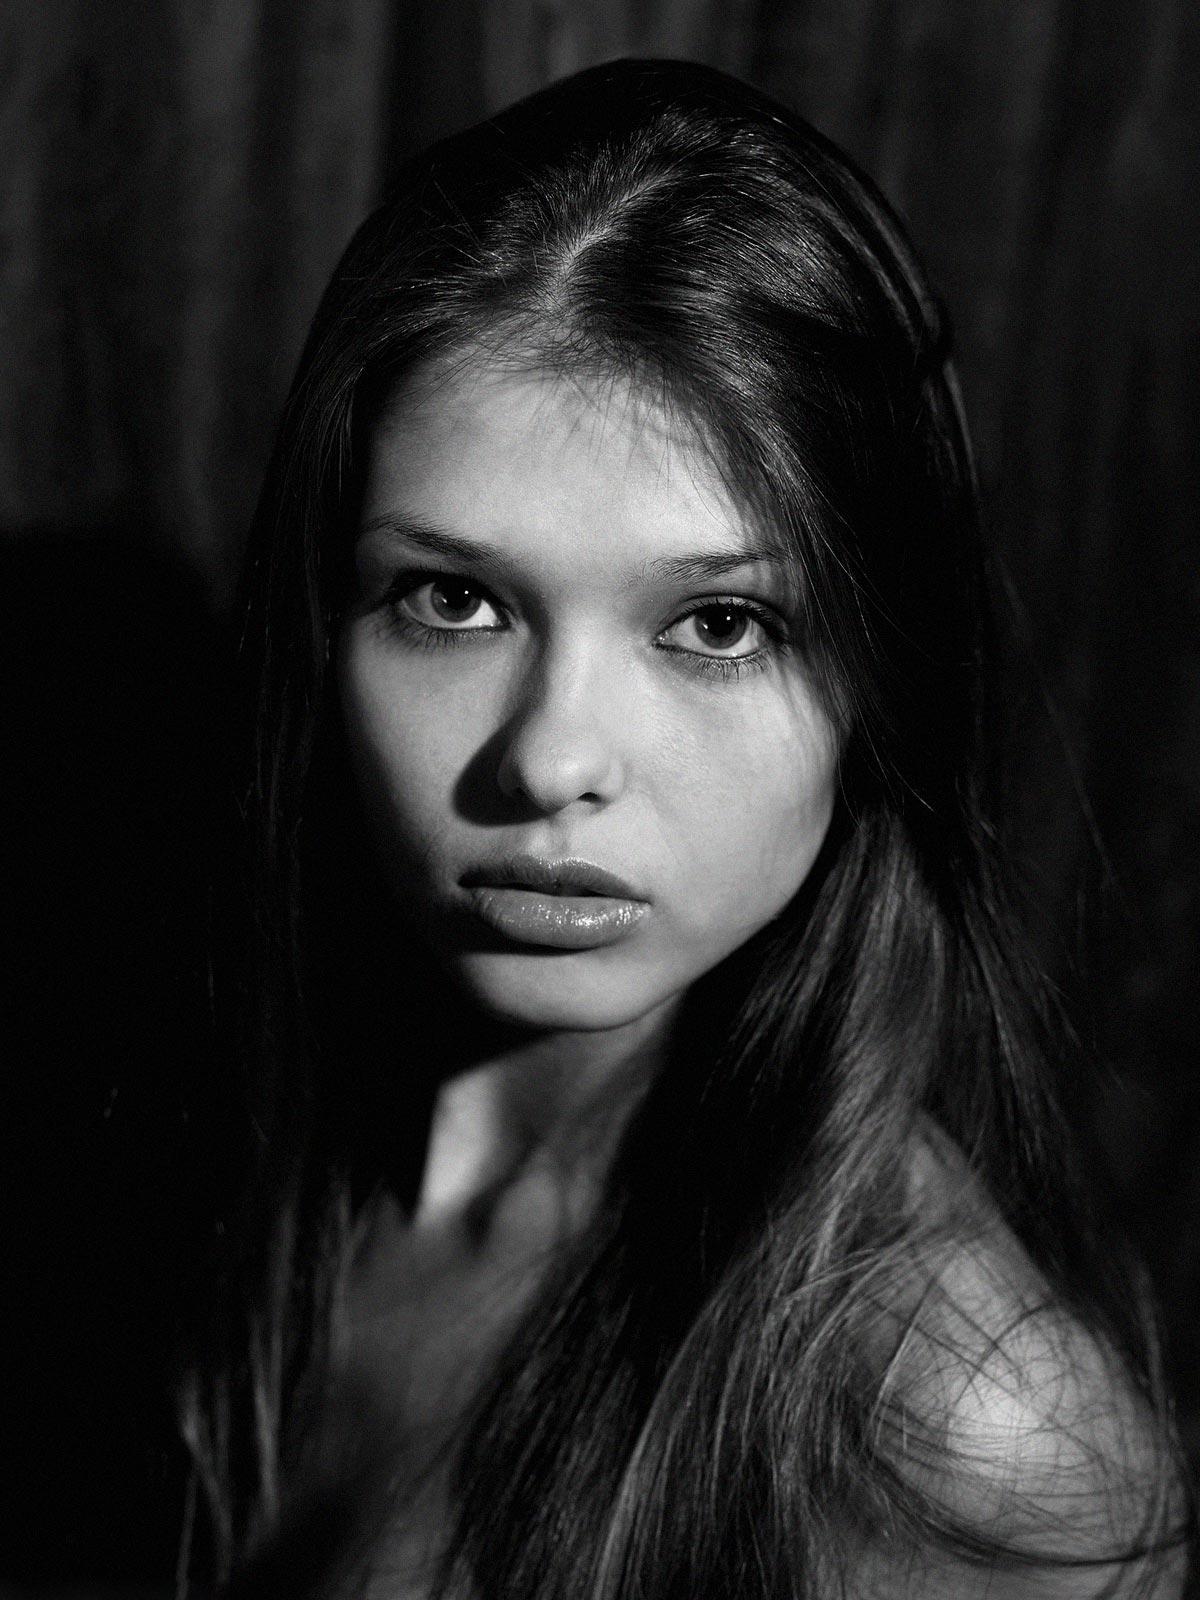 ZOYA HEGRE. Nu en noir et blanc (14 photos de nu)